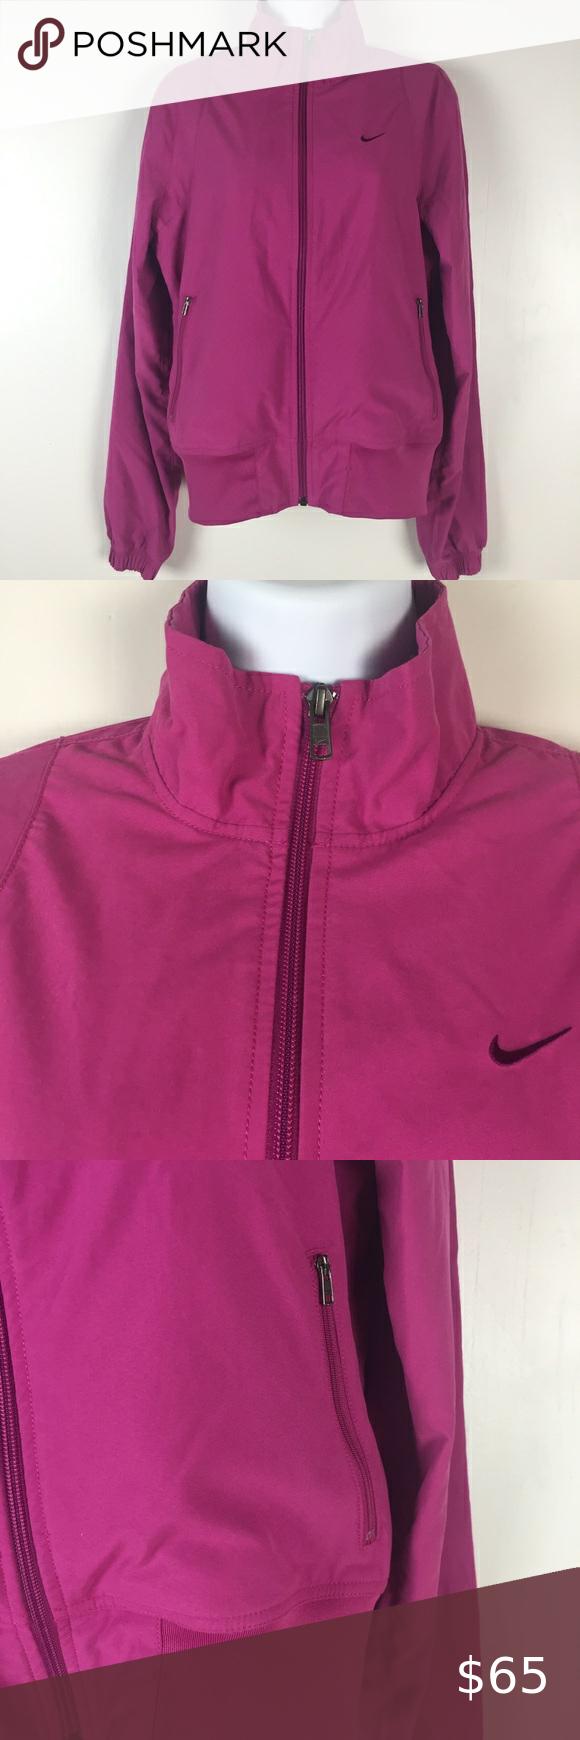 Nike Bomber Jacket Womens Size Medium Magenta Full Bomber Jacket Women Nike Bomber Jacket Jackets For Women [ 1740 x 580 Pixel ]